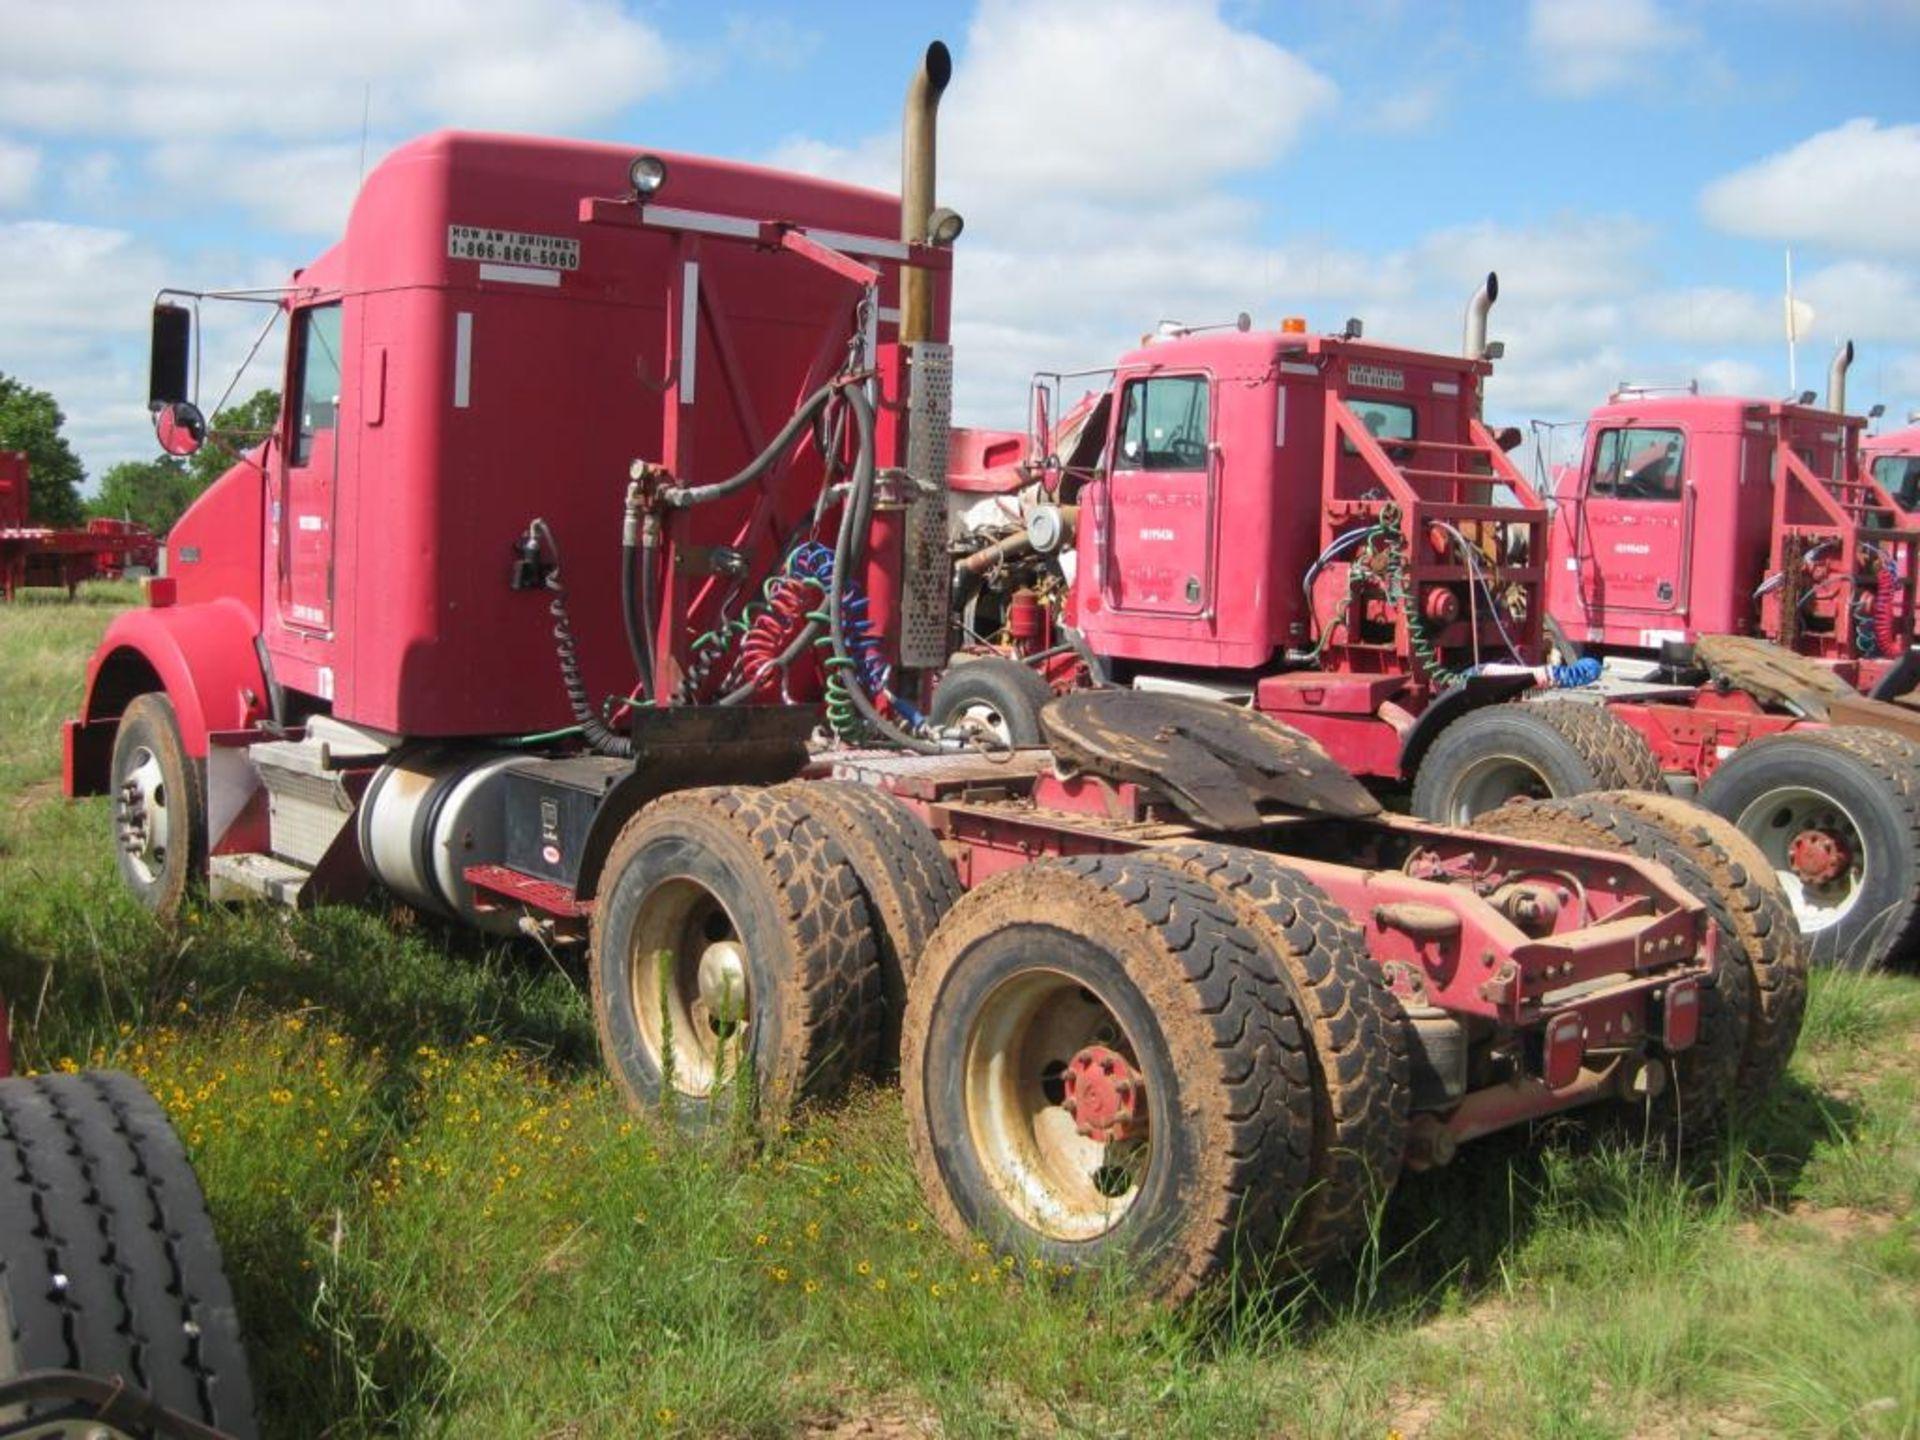 Kenworth Truck - Image 5 of 20